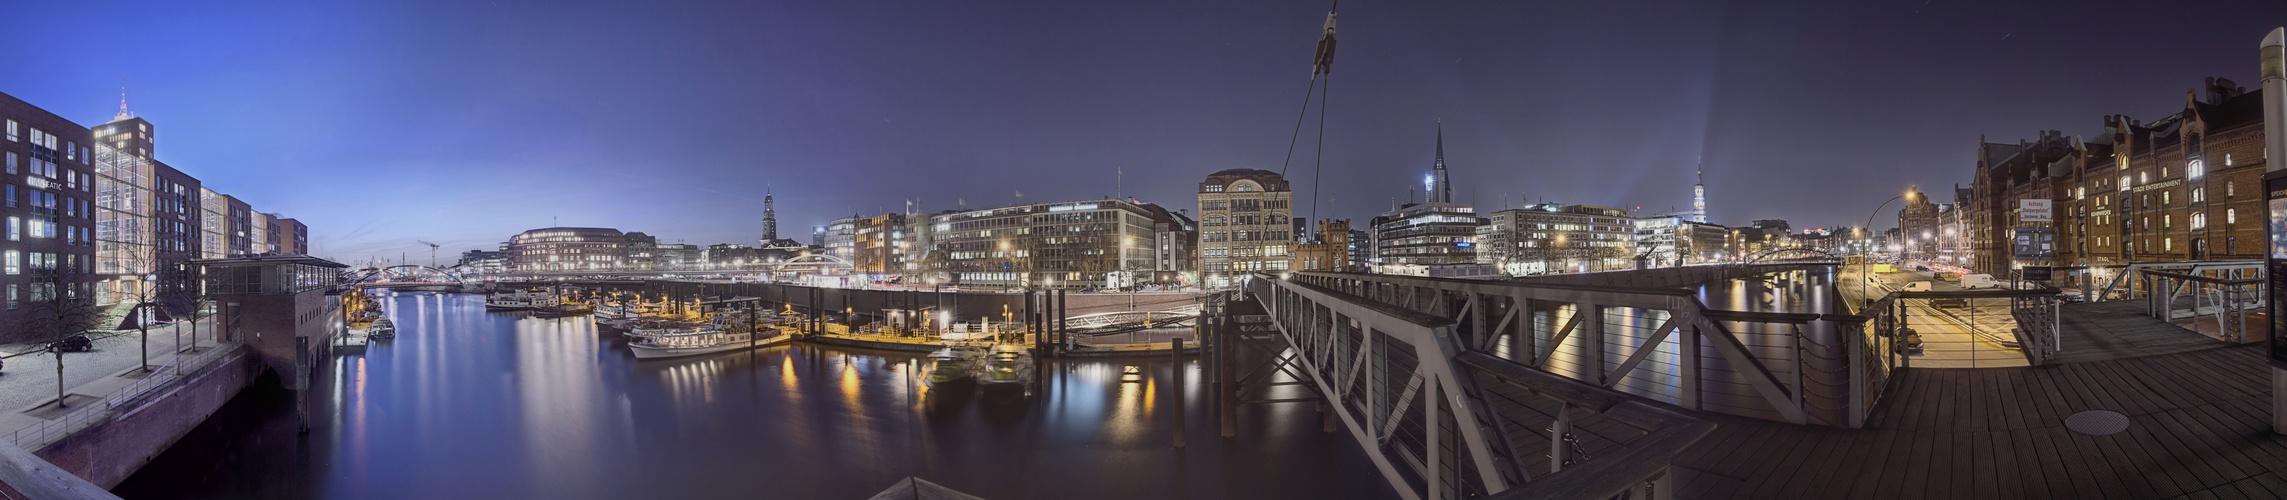 Panorama vom Fleet